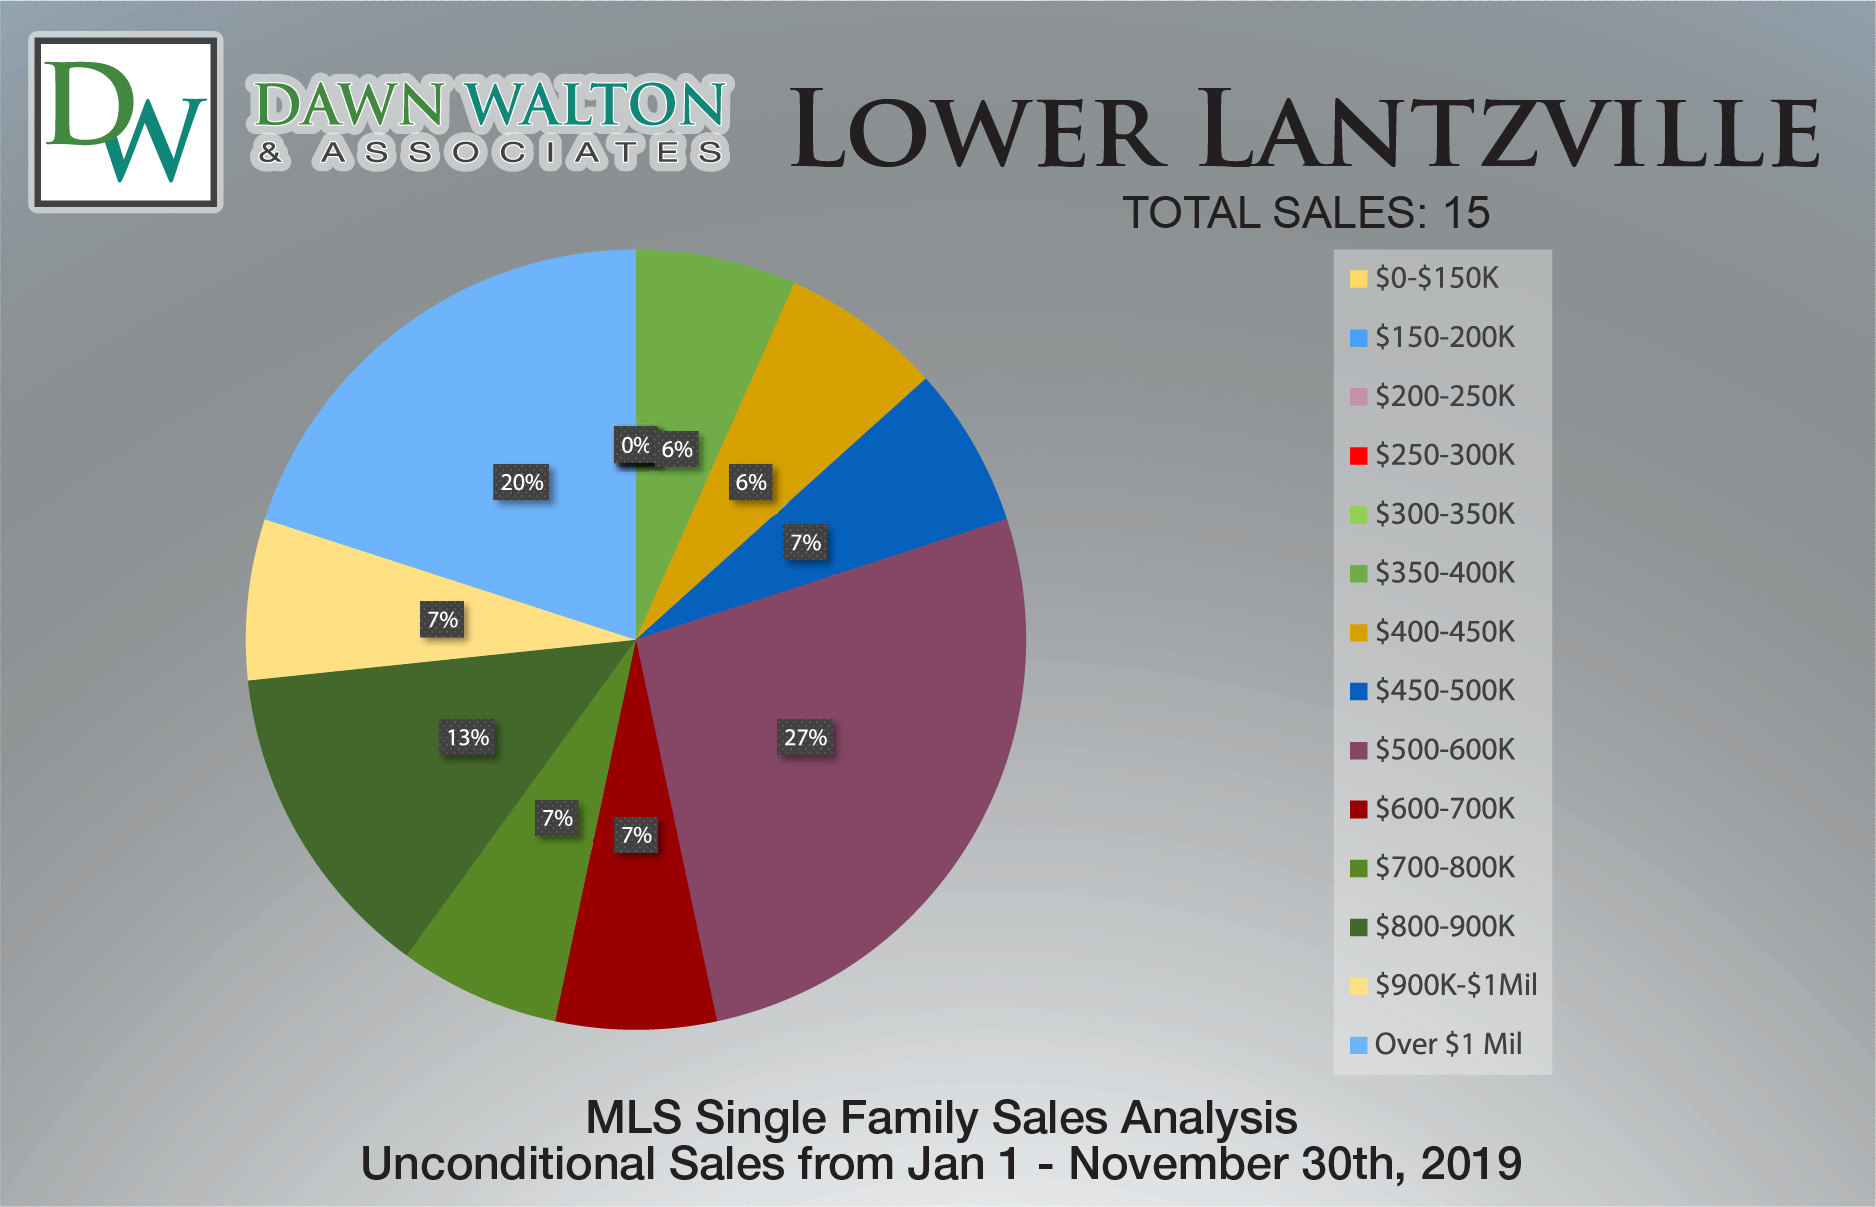 Lower Lantzville Real Estate Market Stats Price Percentage Jan 1-Nov 30 2019 - Nanaimo Realtor Dawn Walton